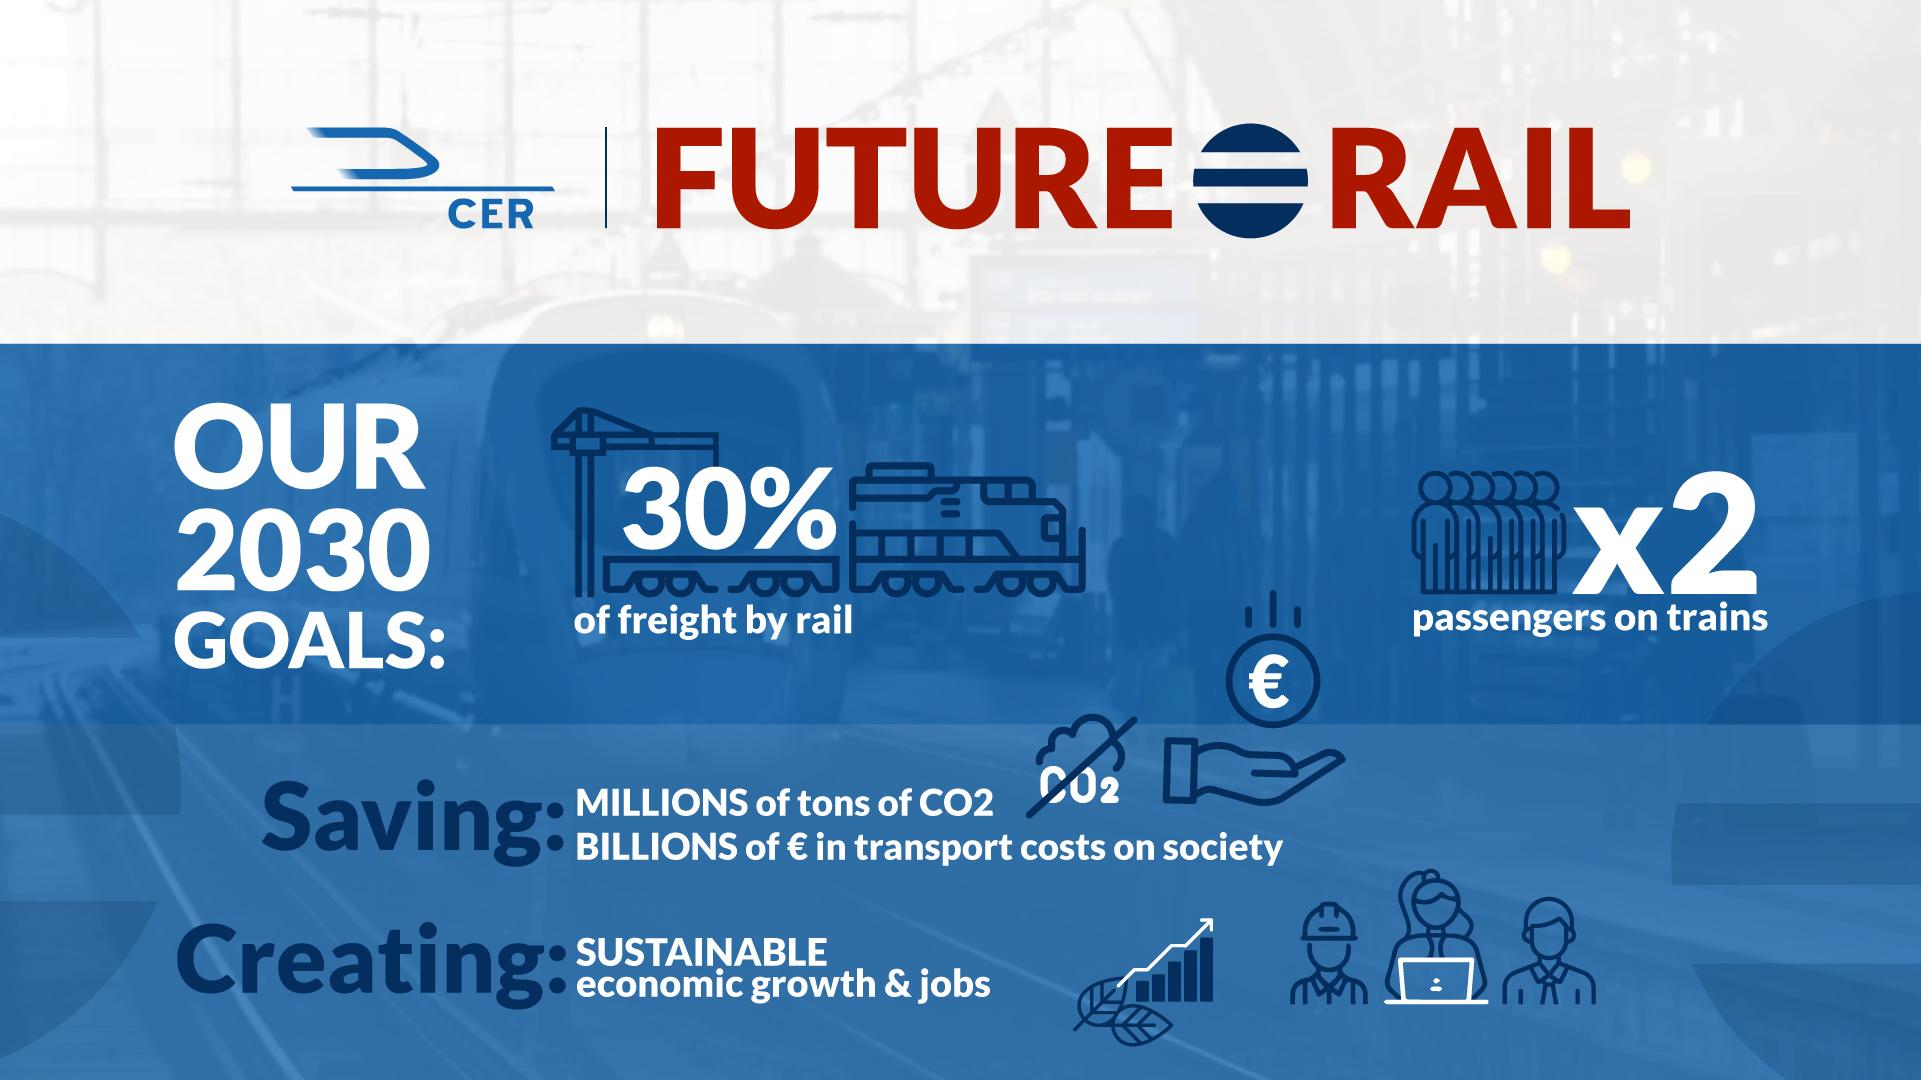 CER 1 FUTURE IS RAIL